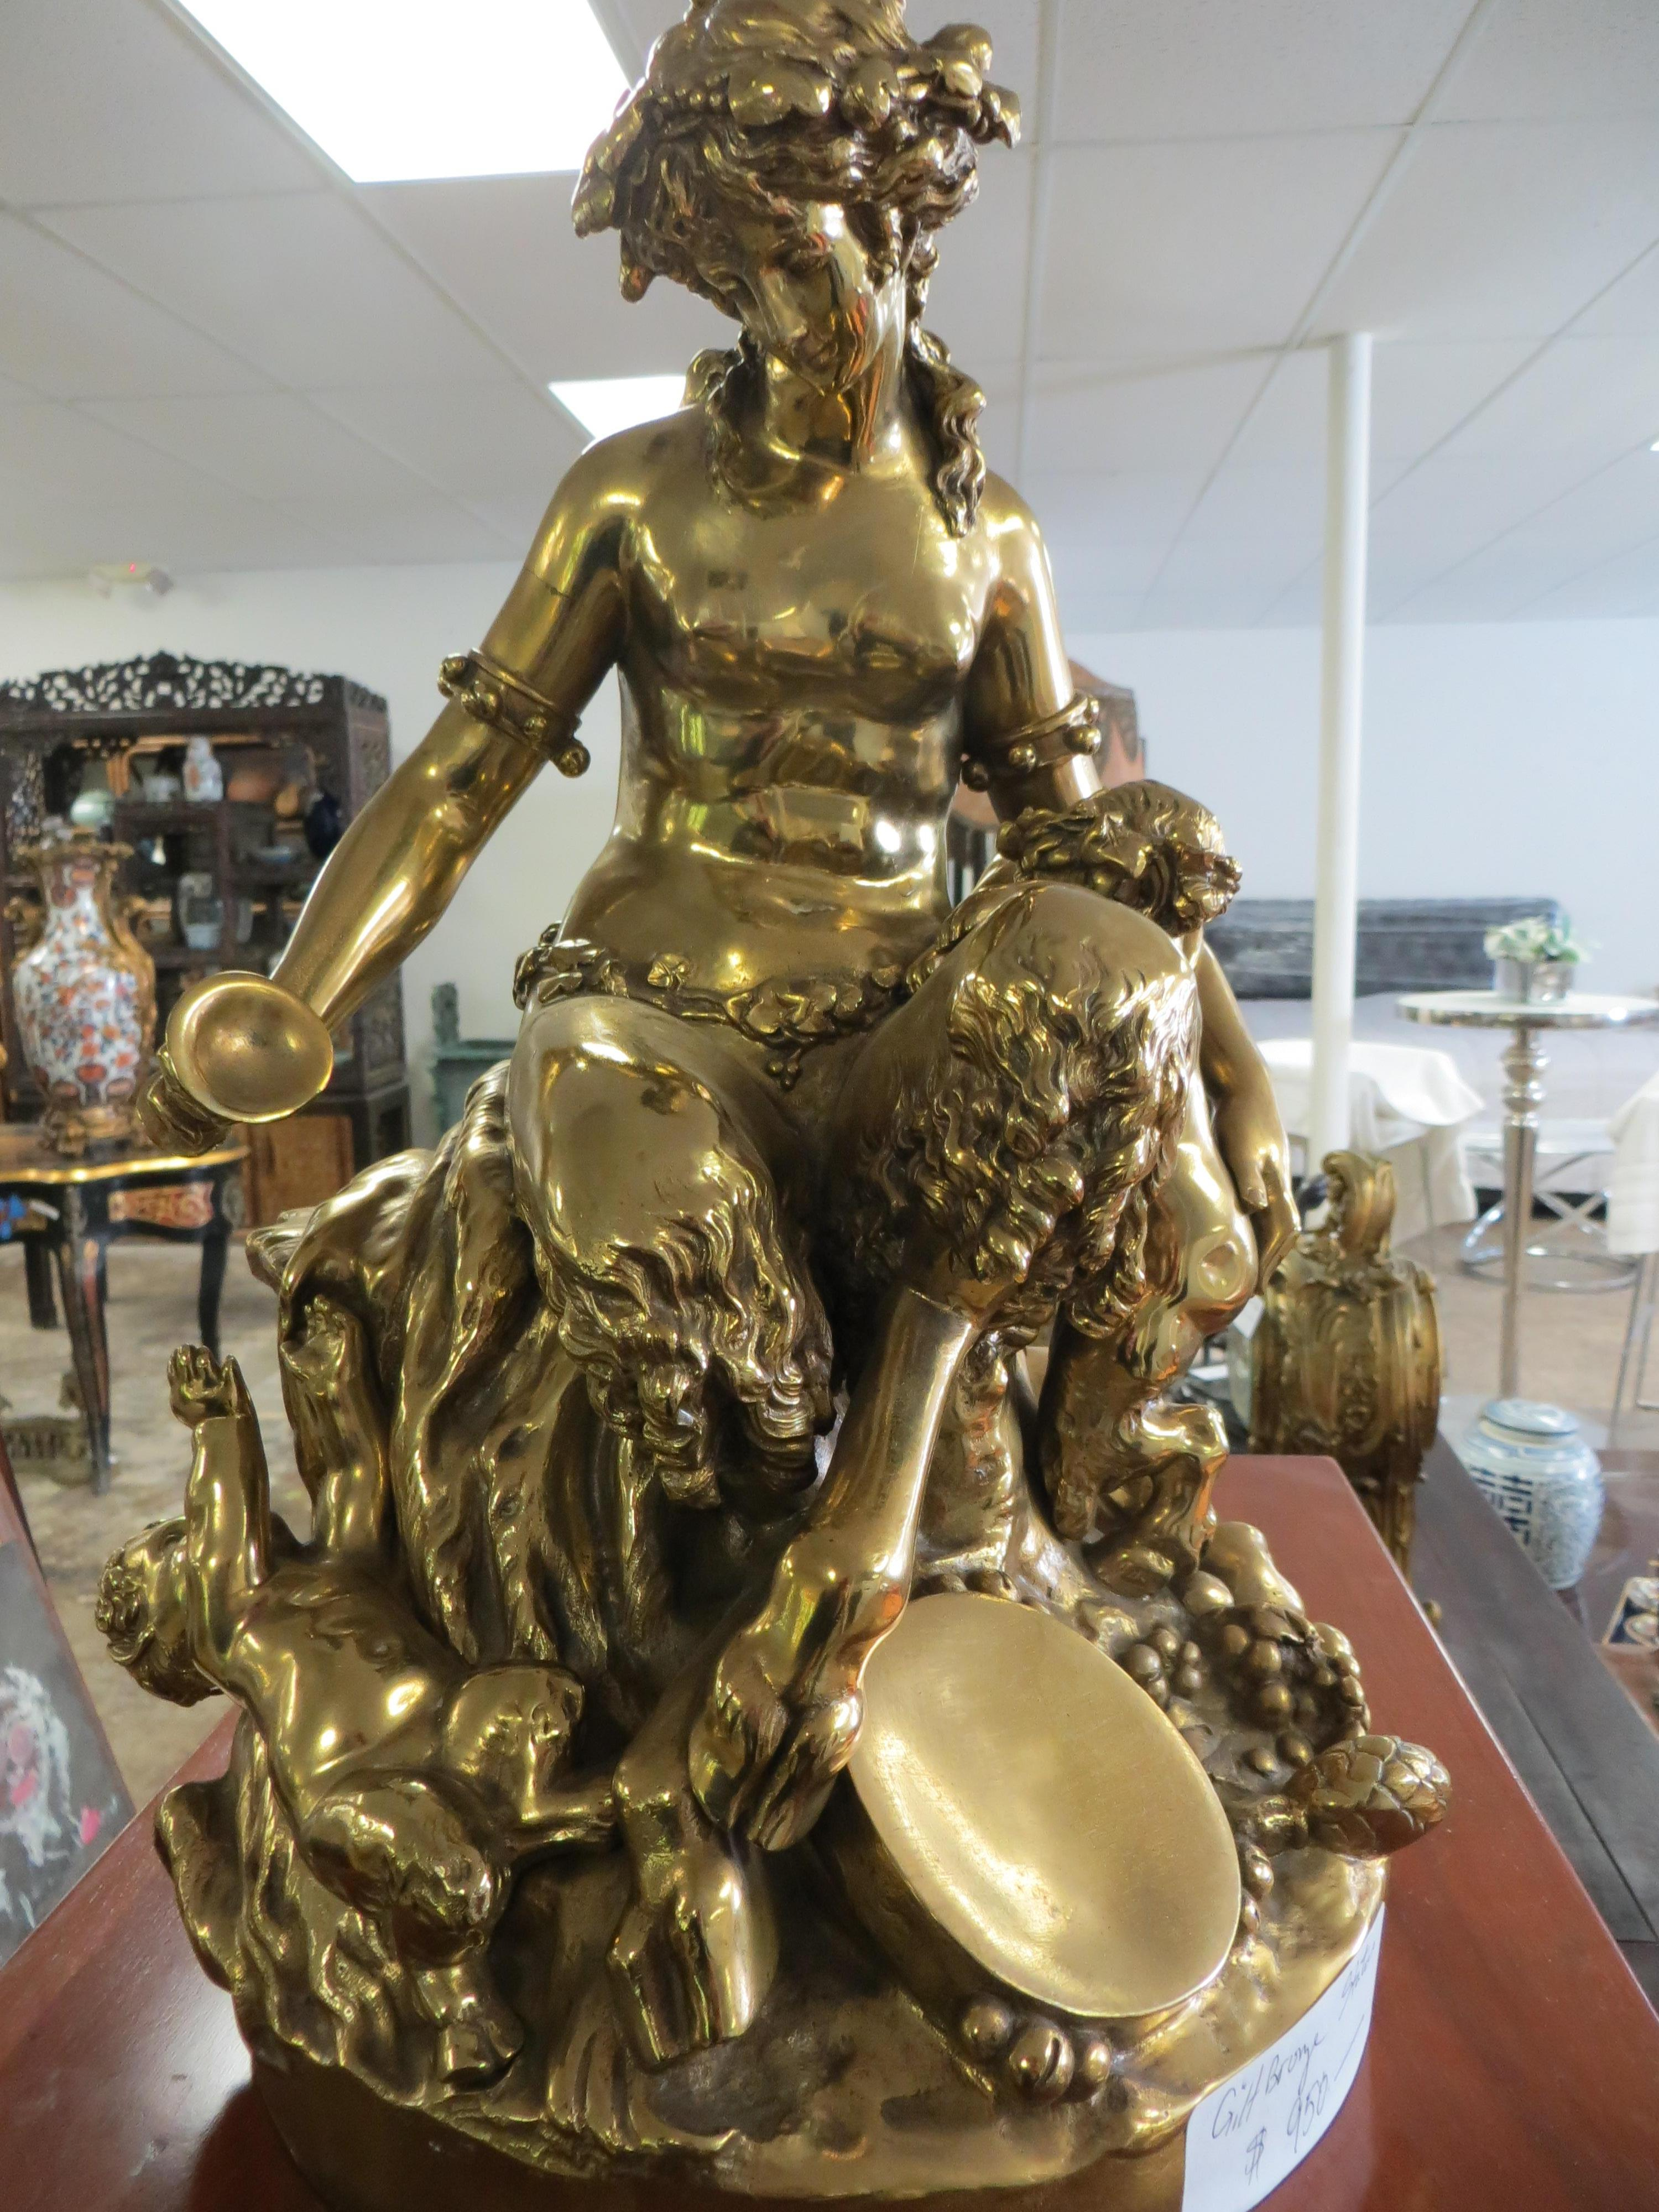 A GOLD PATINATED BRONZE SITTING FAUN